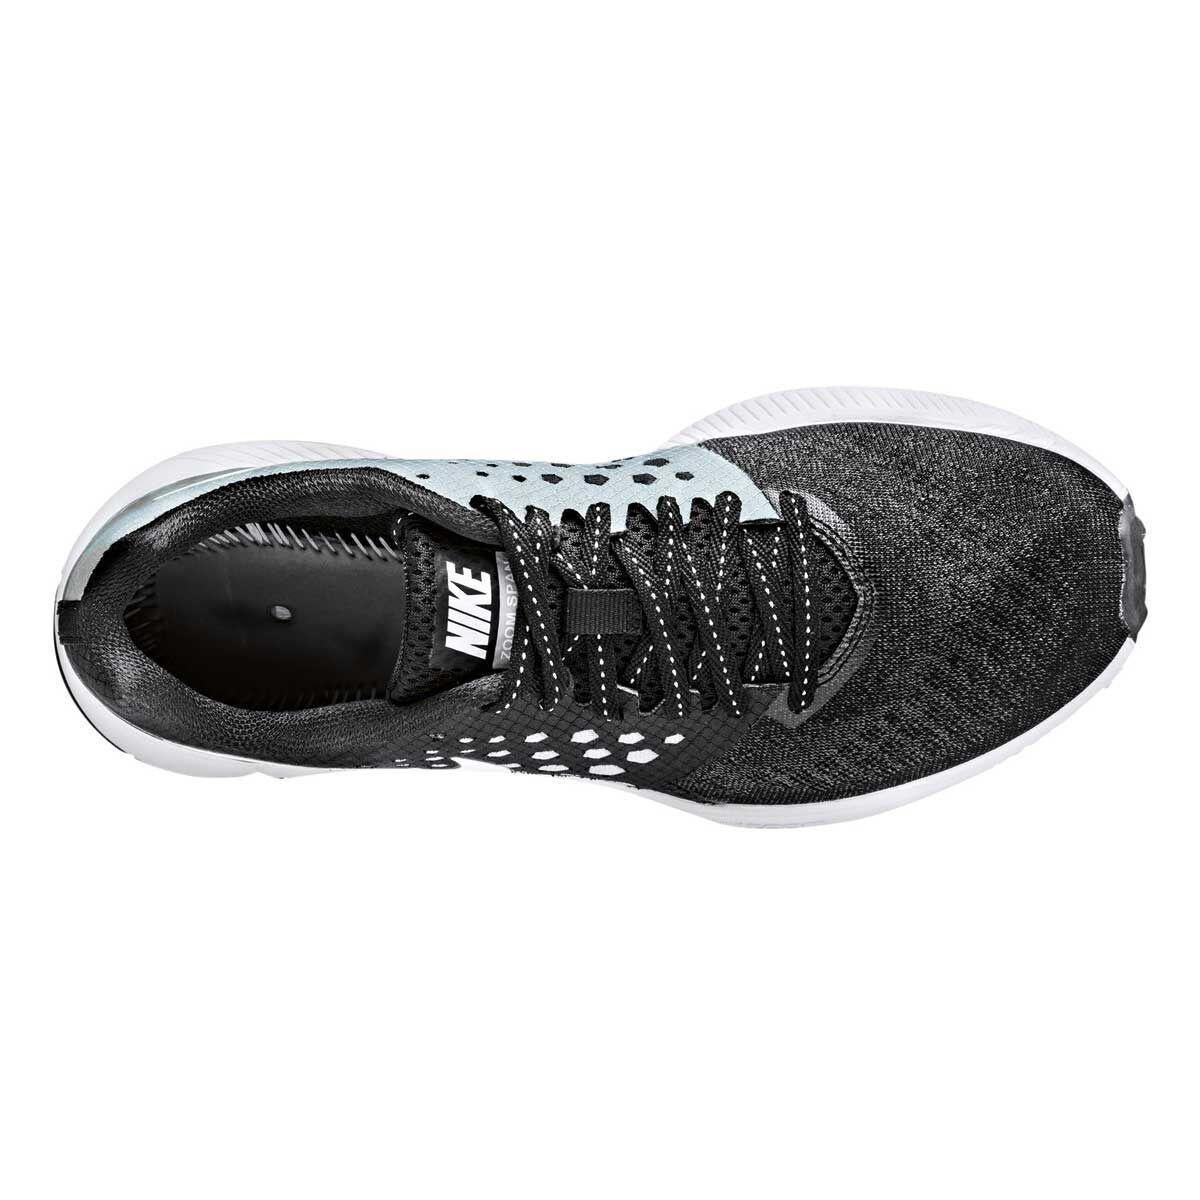 nike air zoom a donne scarpe da corsa nero / bianco 6 rebel sport